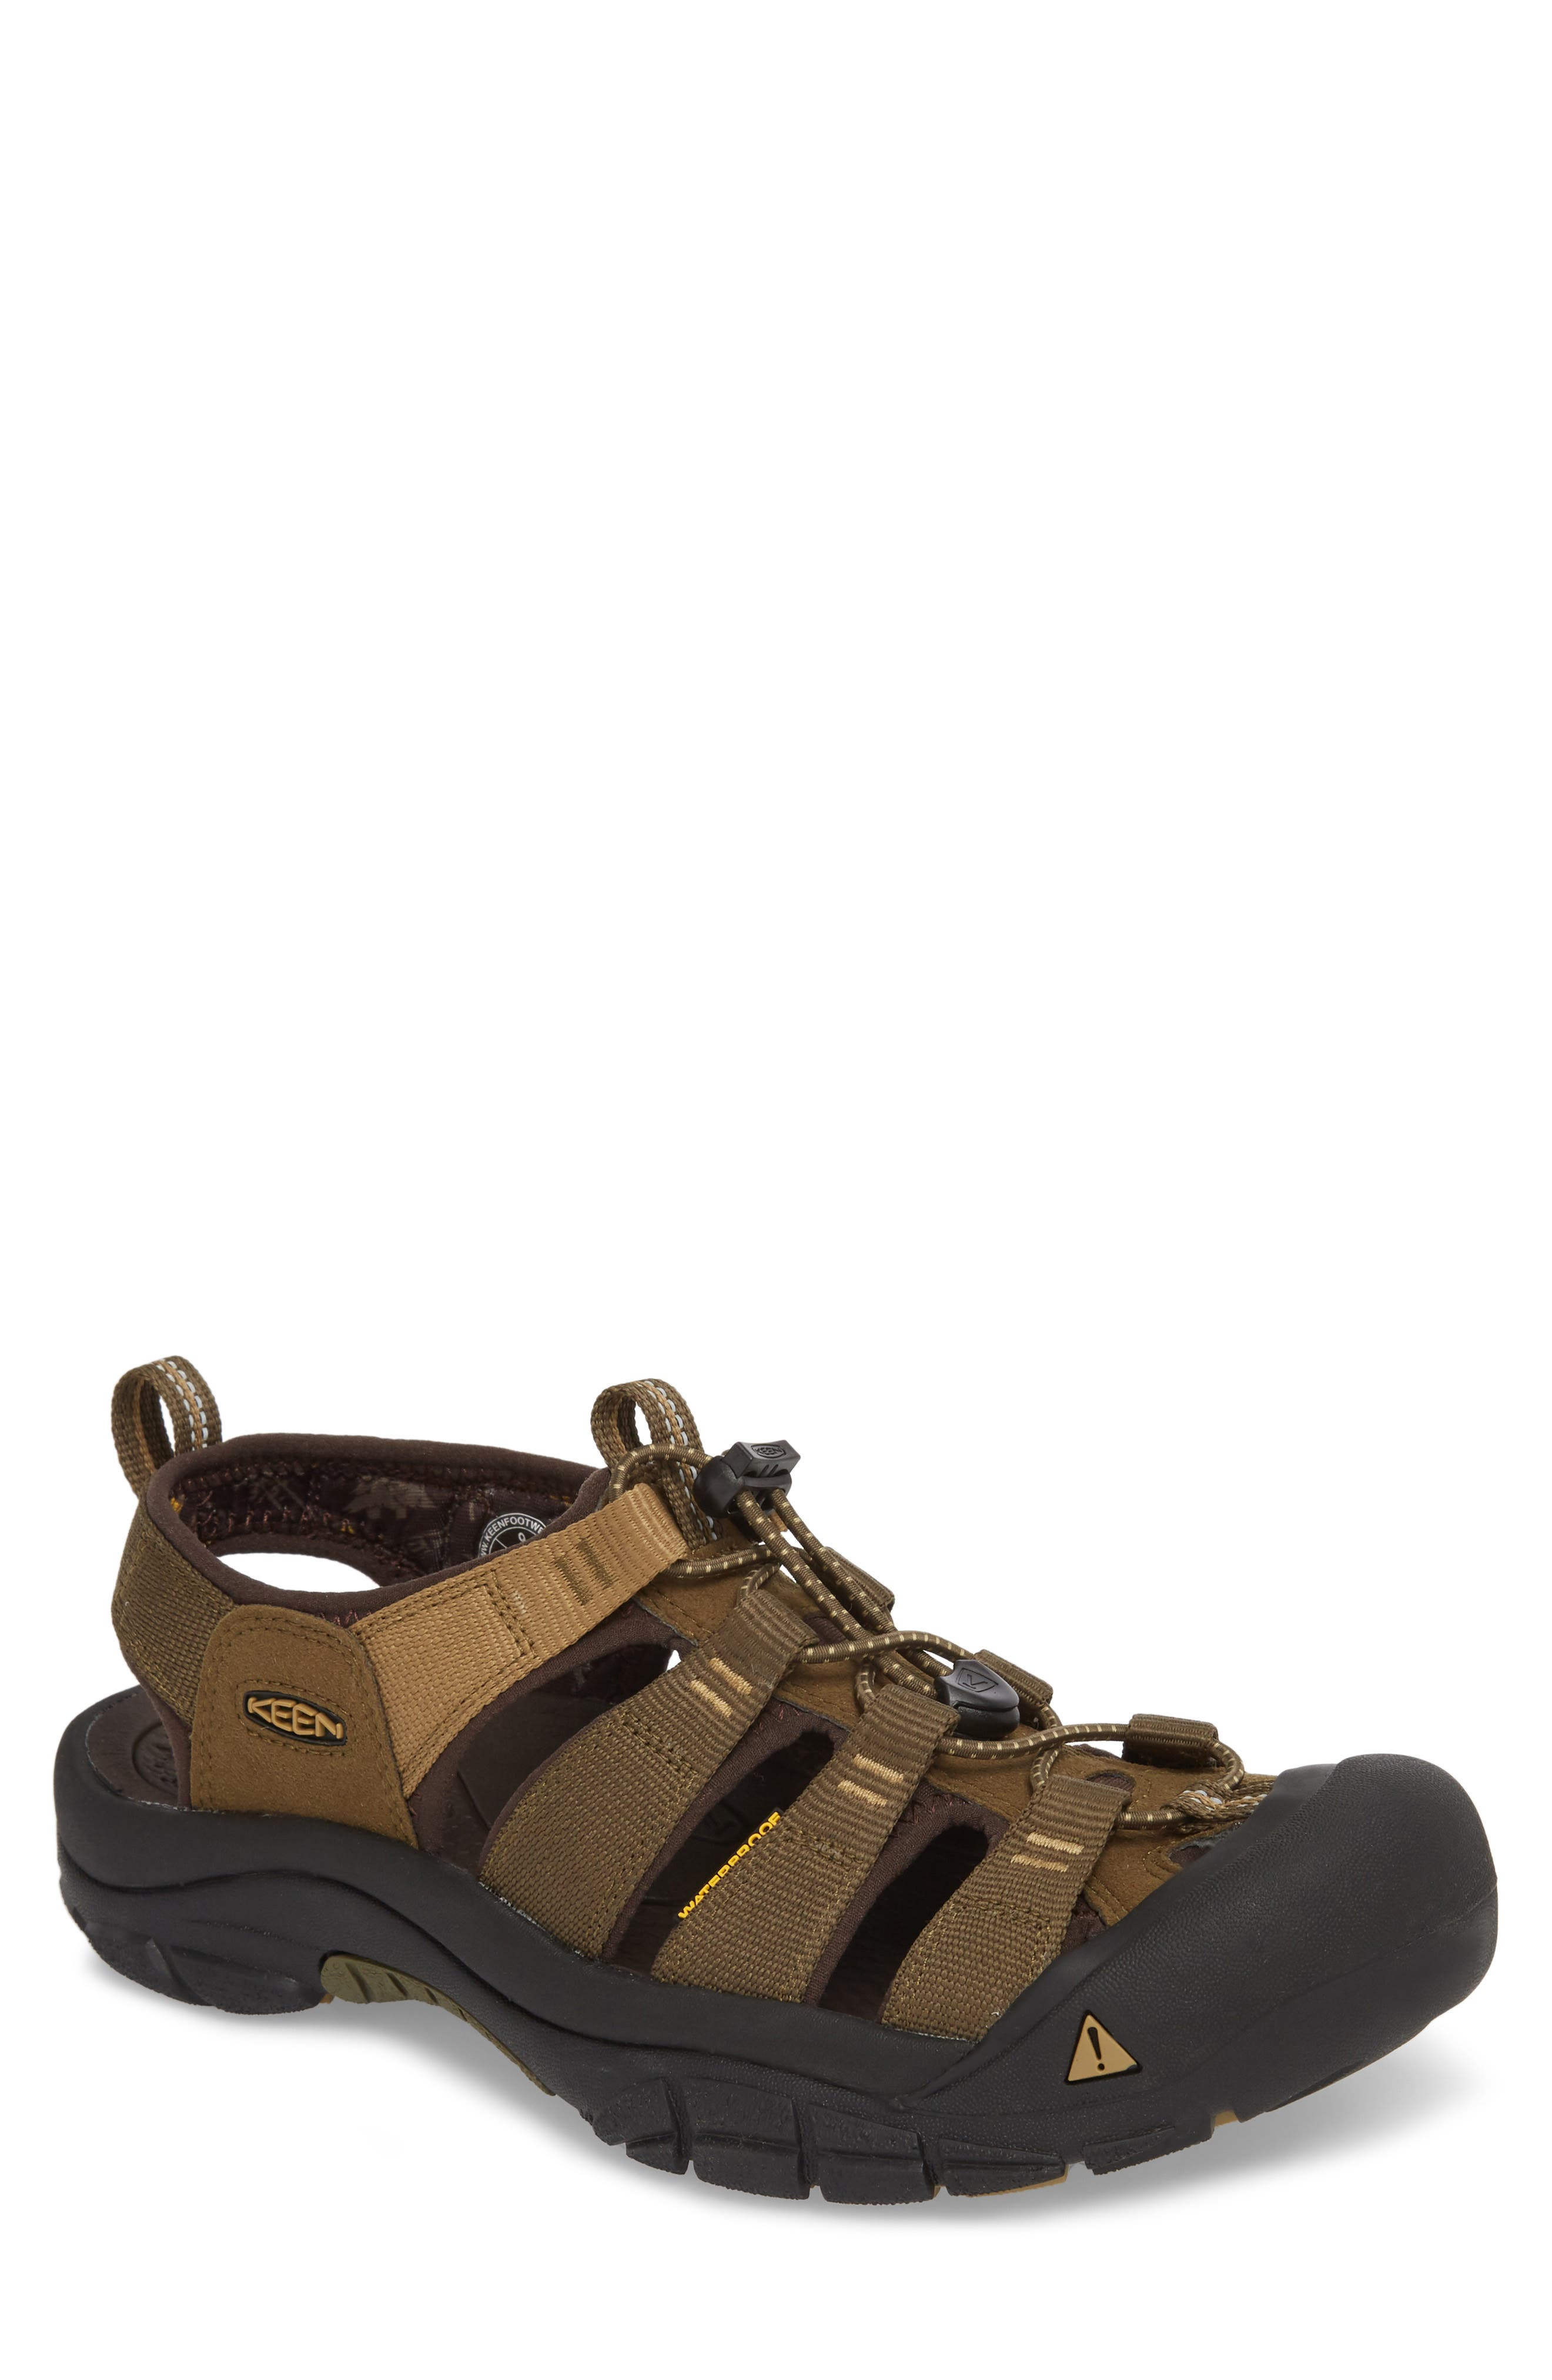 Newport Hydro Sandal